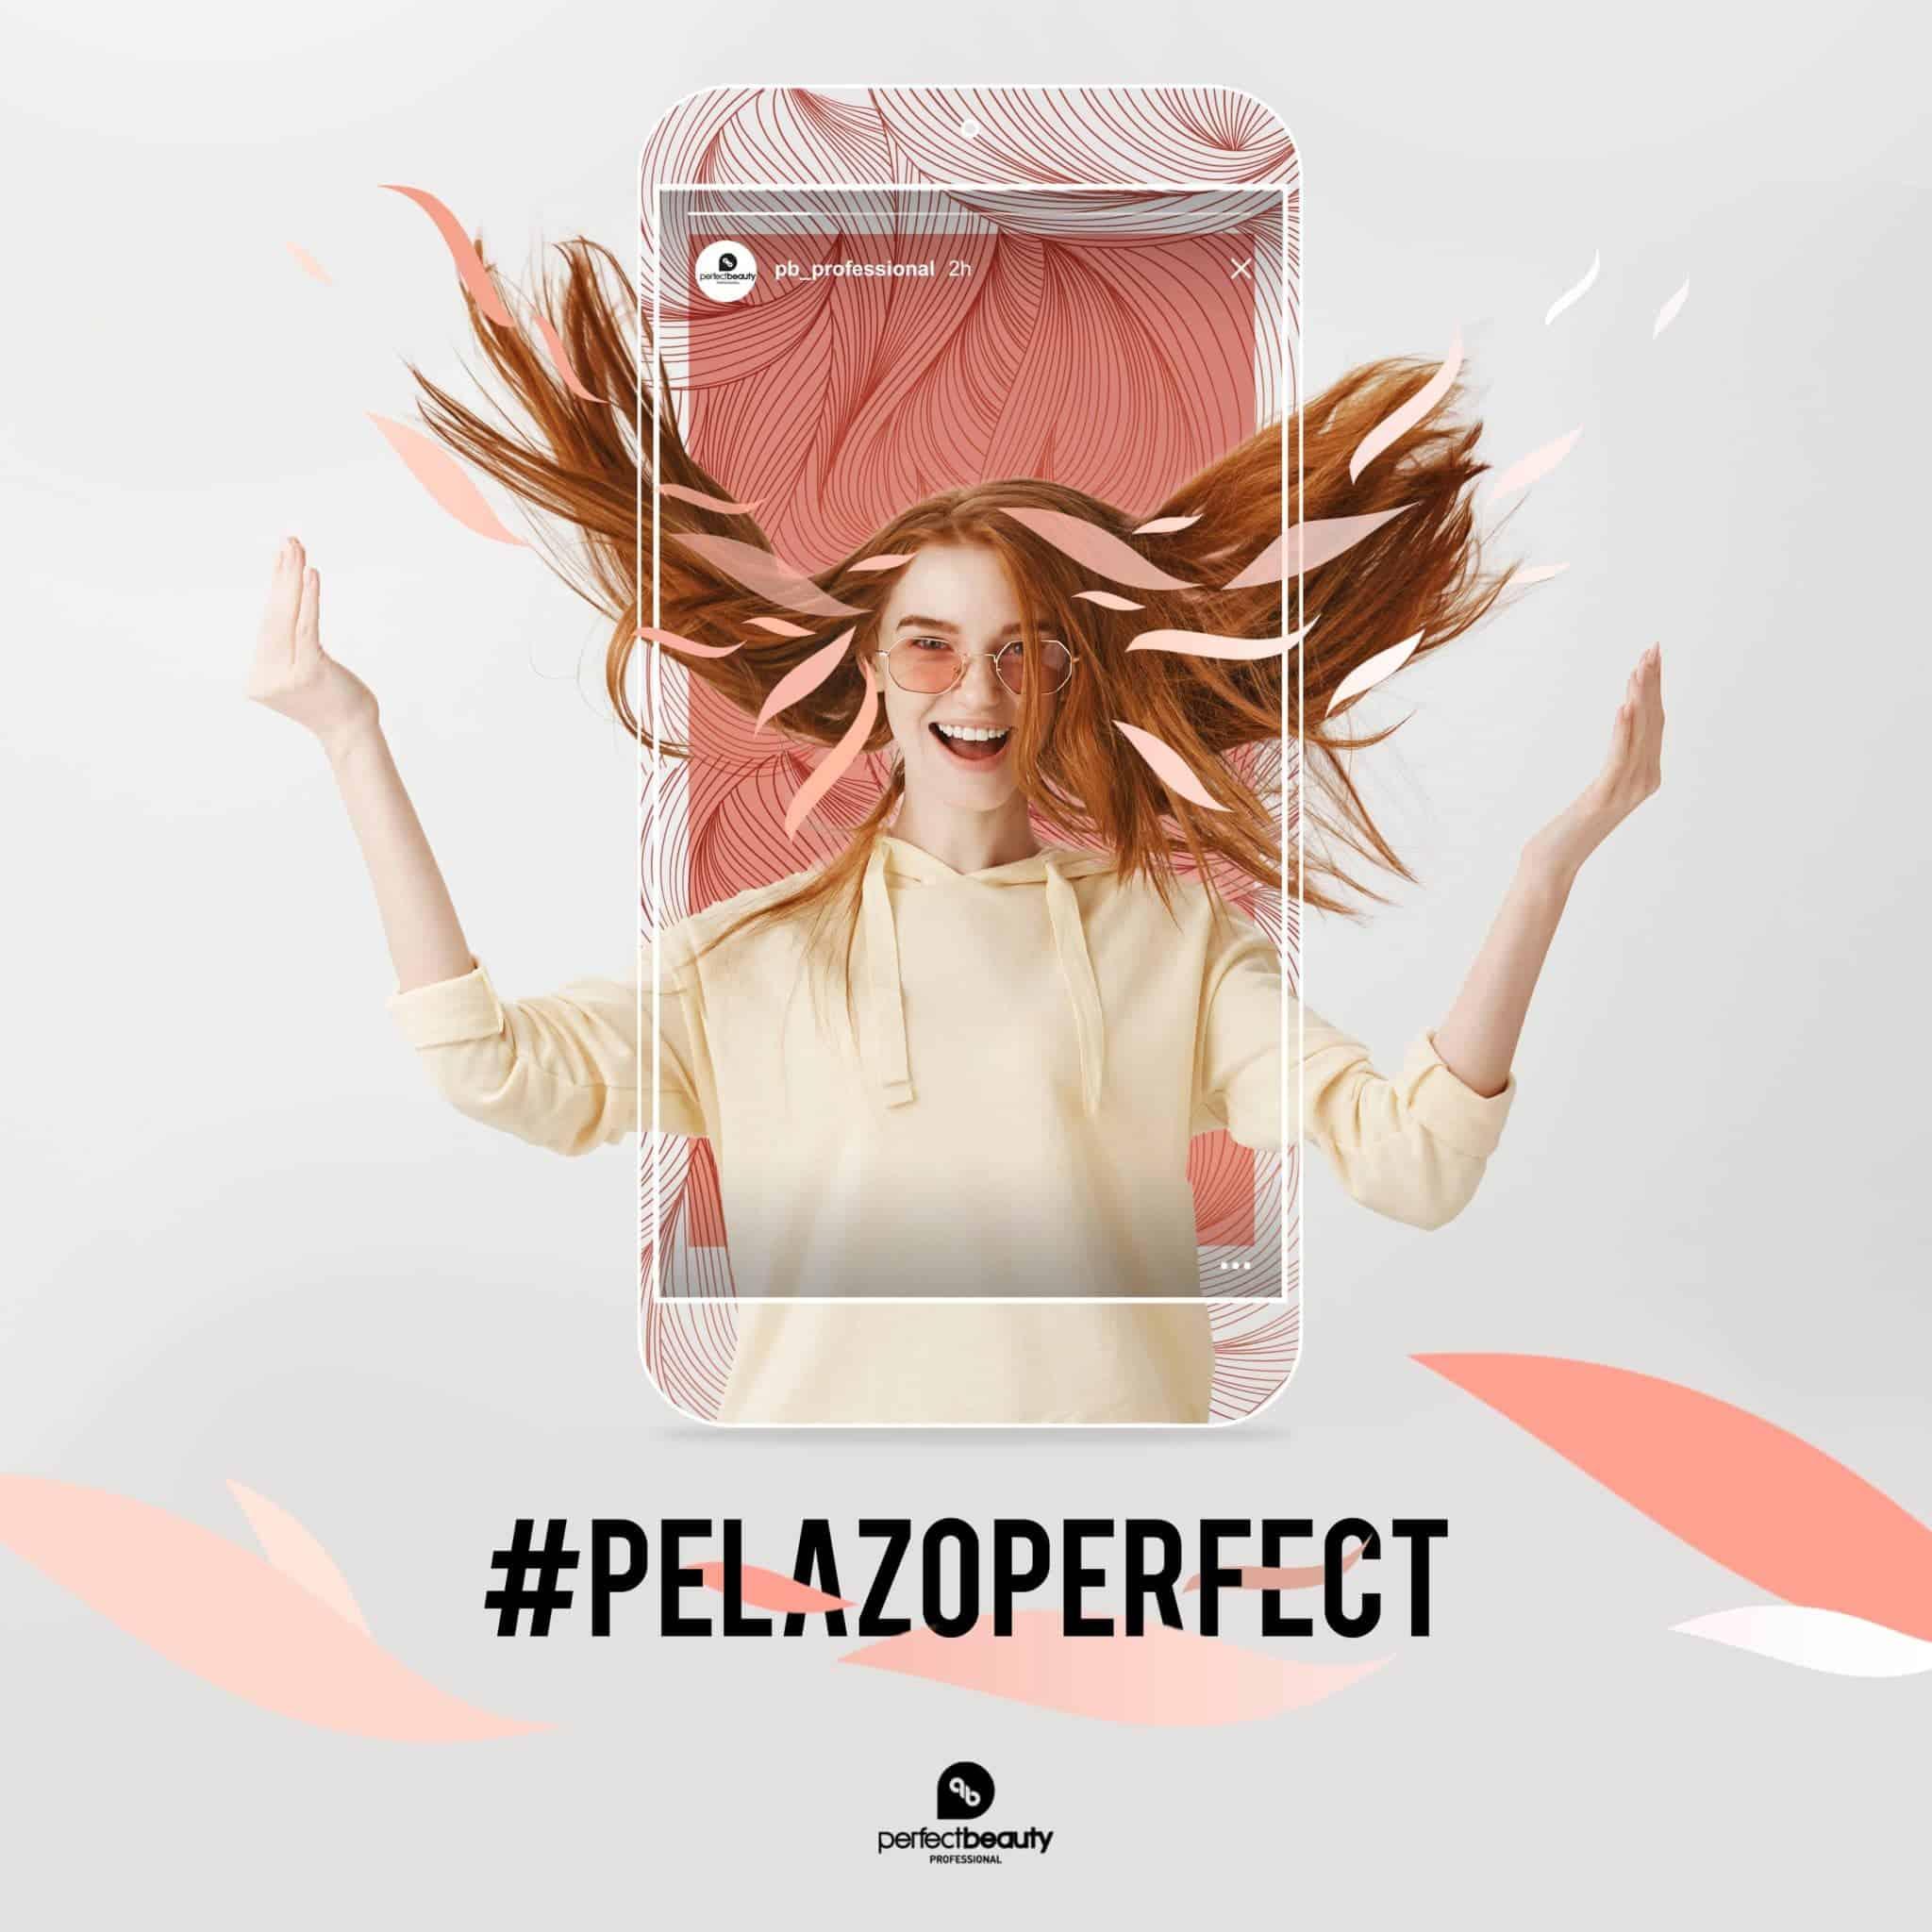 Campaña de marketing de influencers para Perfect Beauty 12